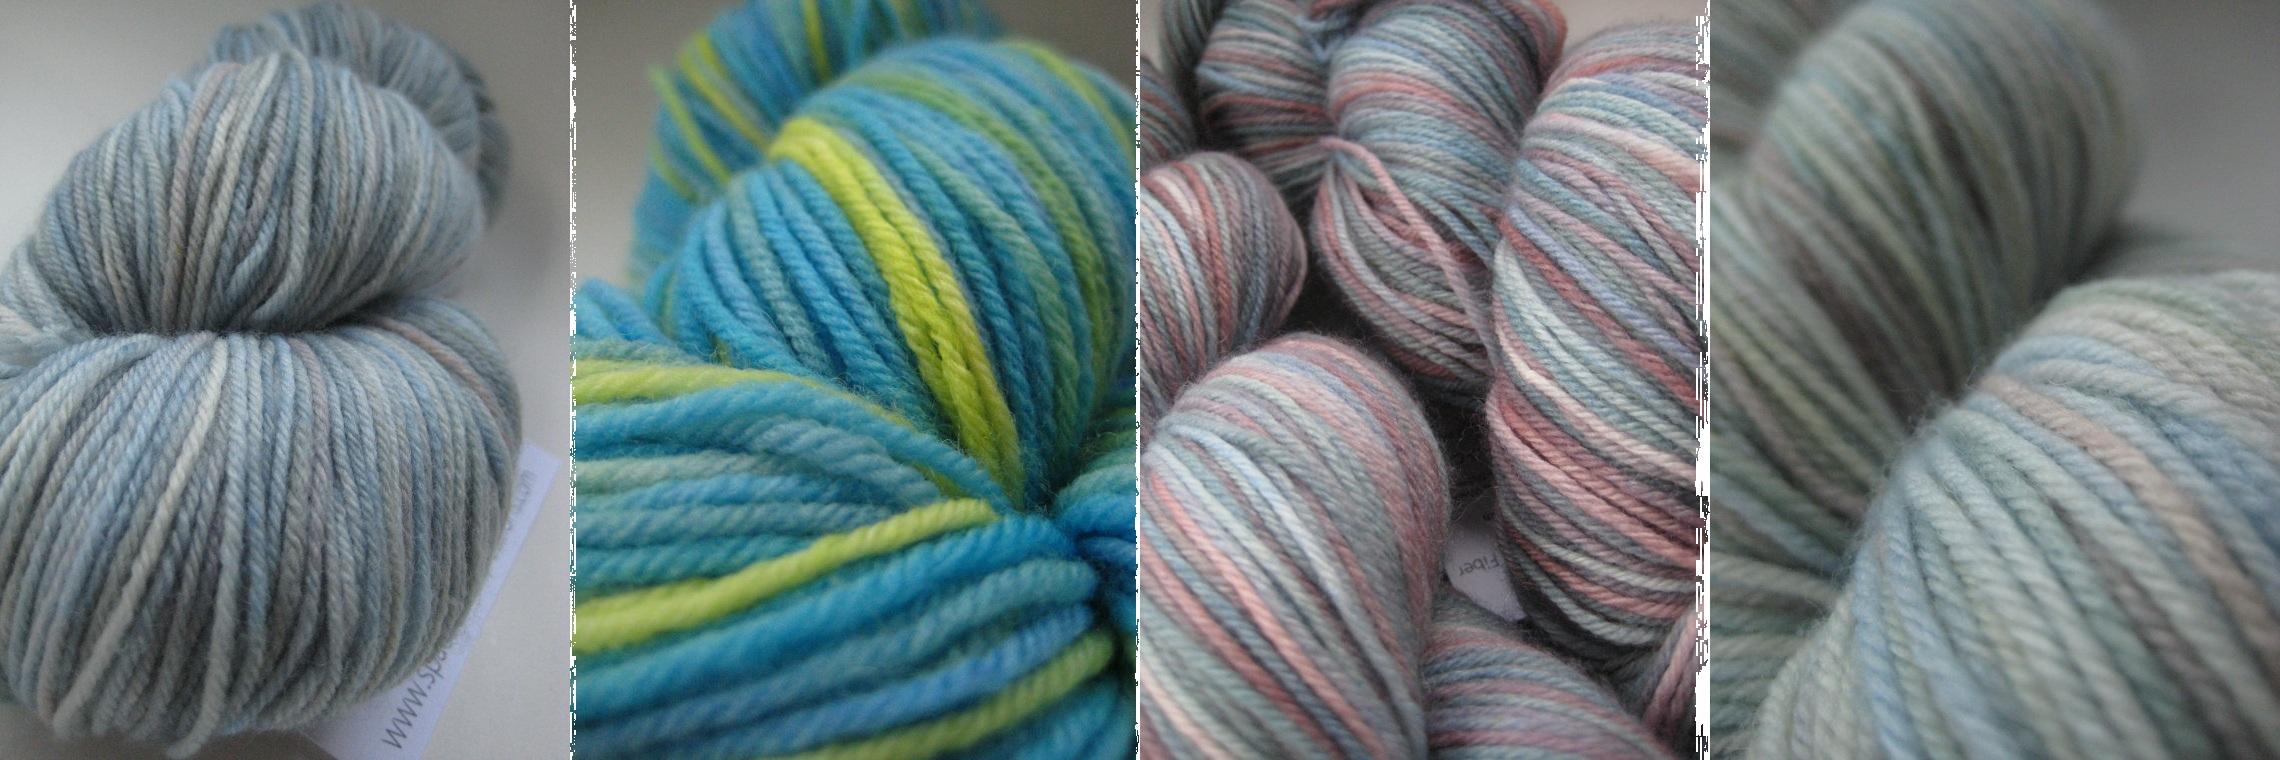 knitting, yarn, crochet, handdyed, indie dyer